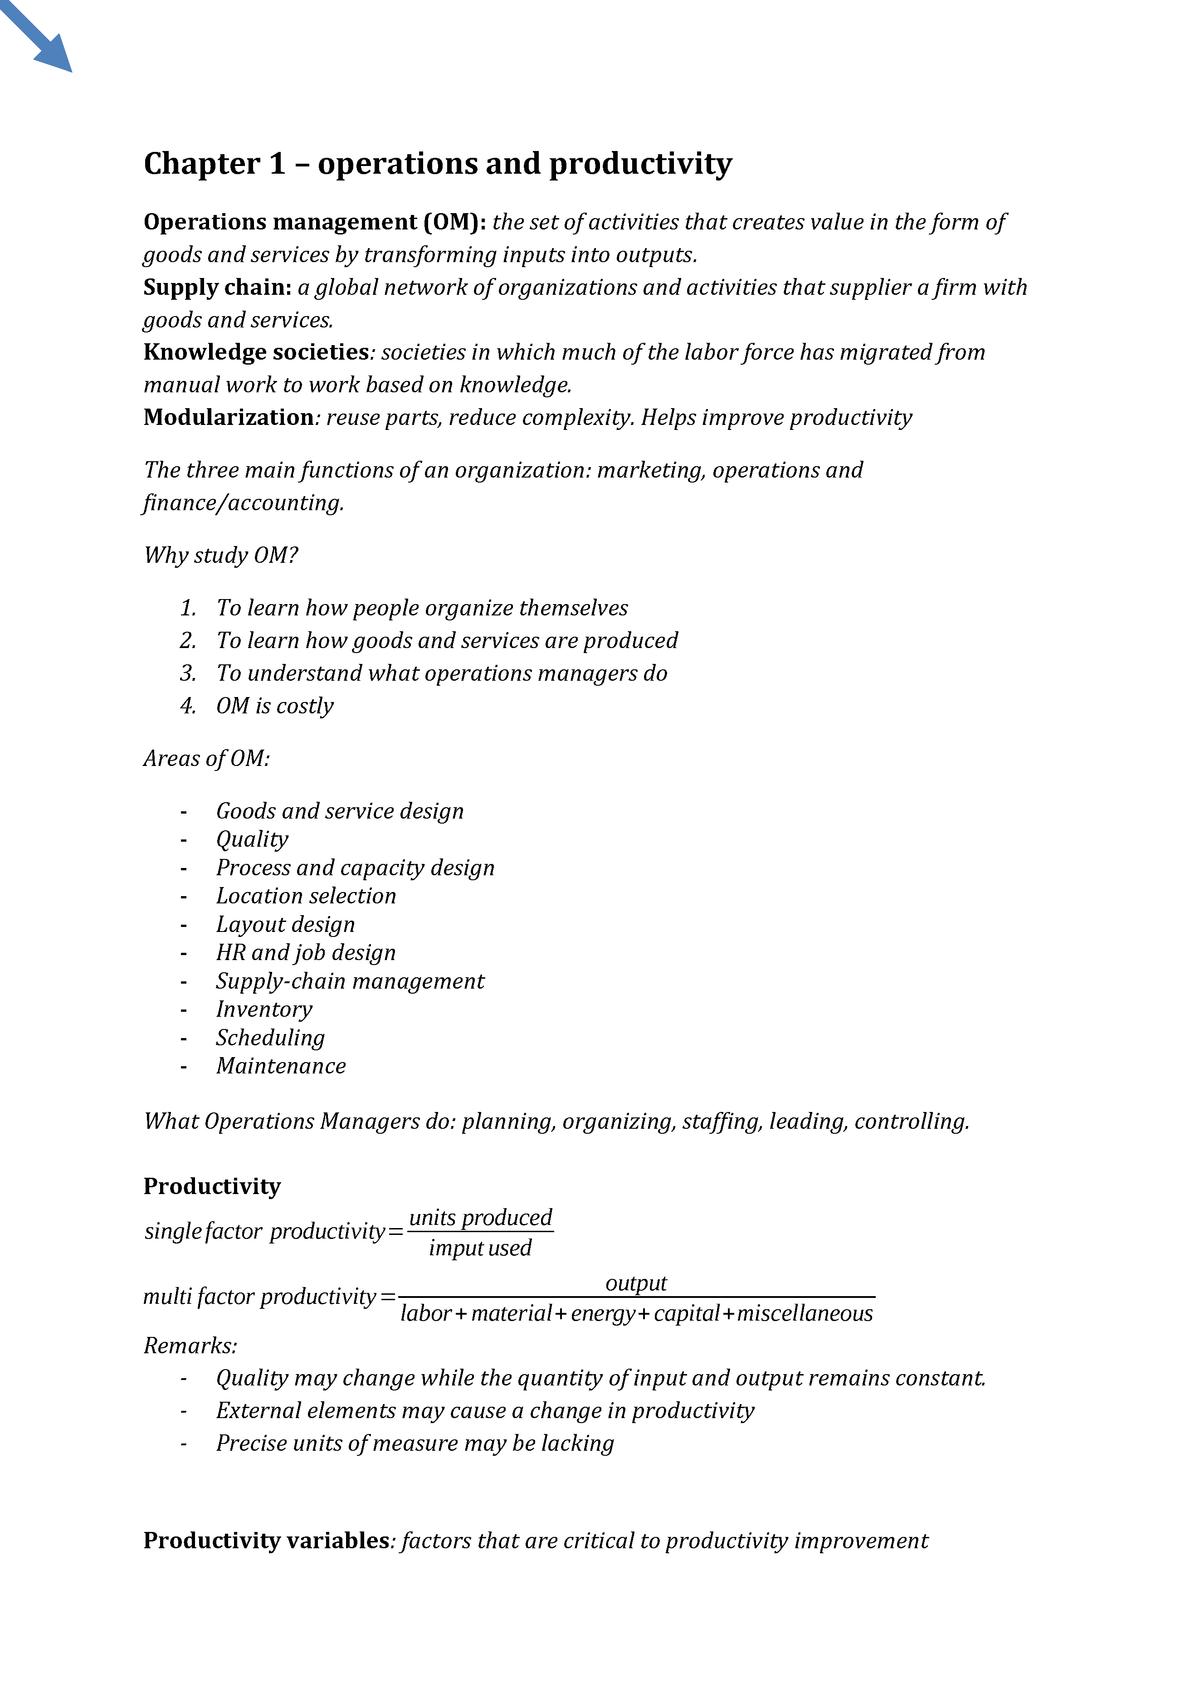 OMSummary - Samenvatting Operations Management - BAP057